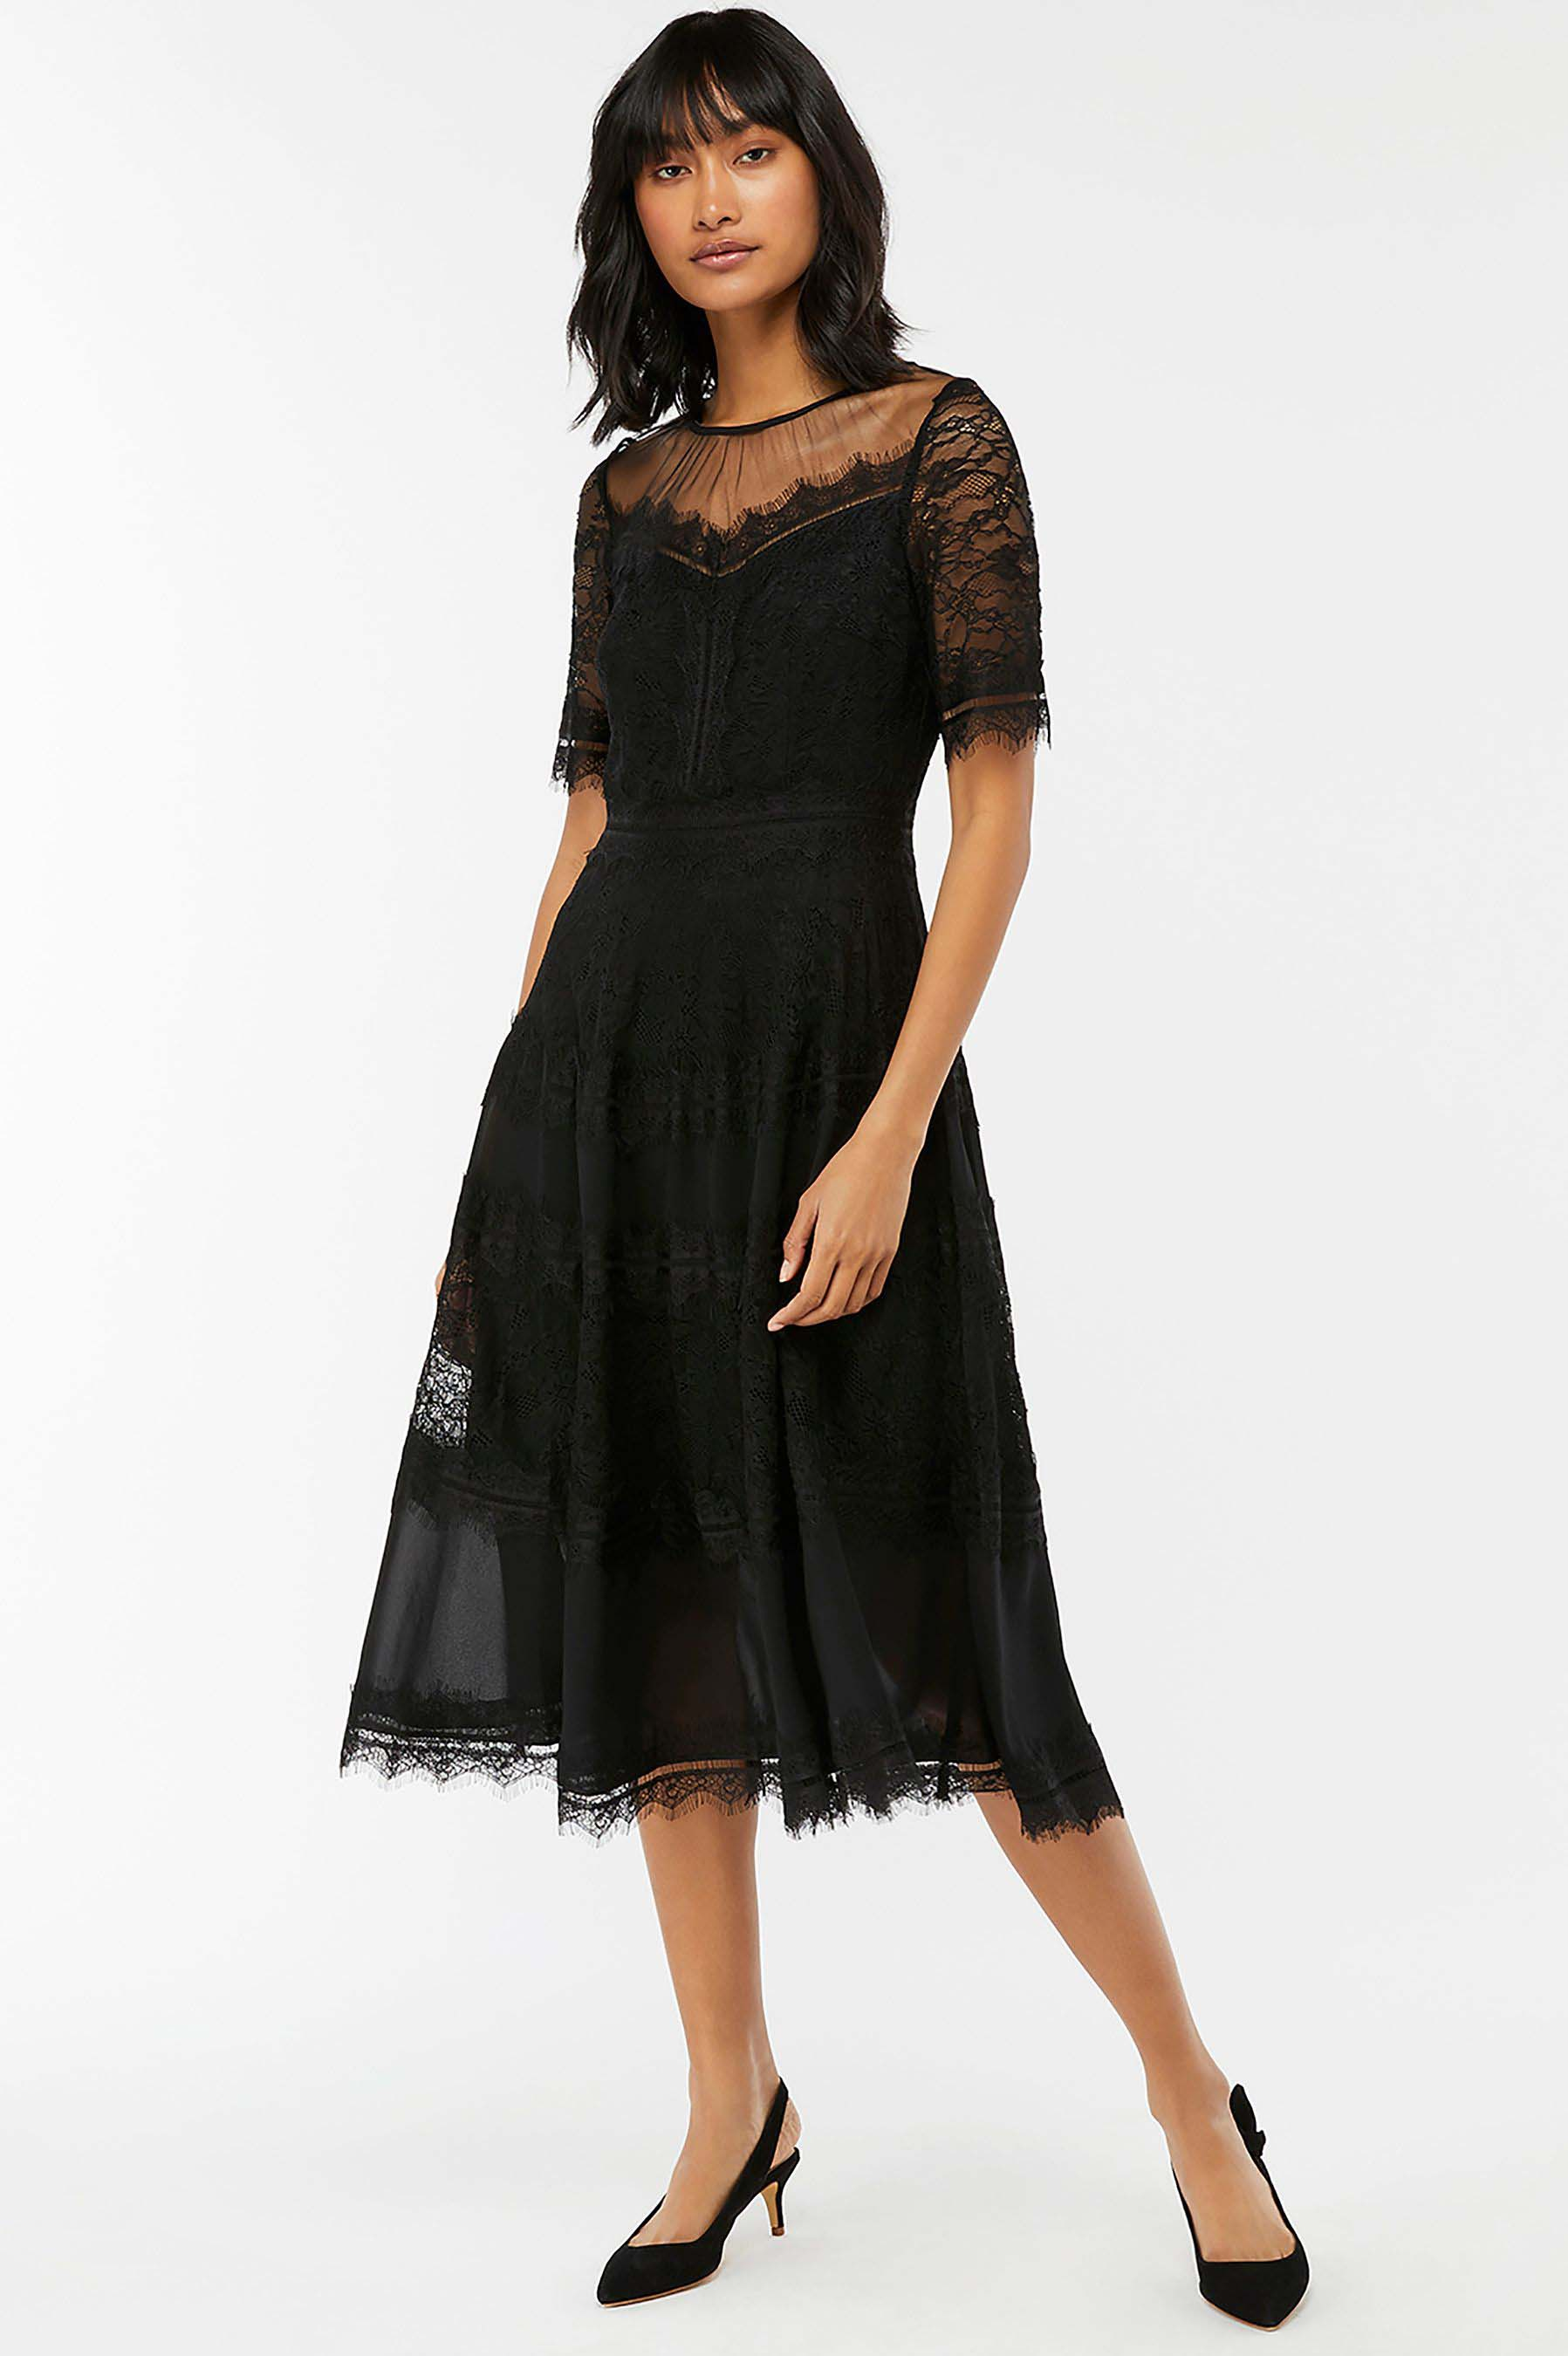 Womens Monsoon Black Clarissa Lace Dress Black Dresses Lace Dress Lace Dress Black